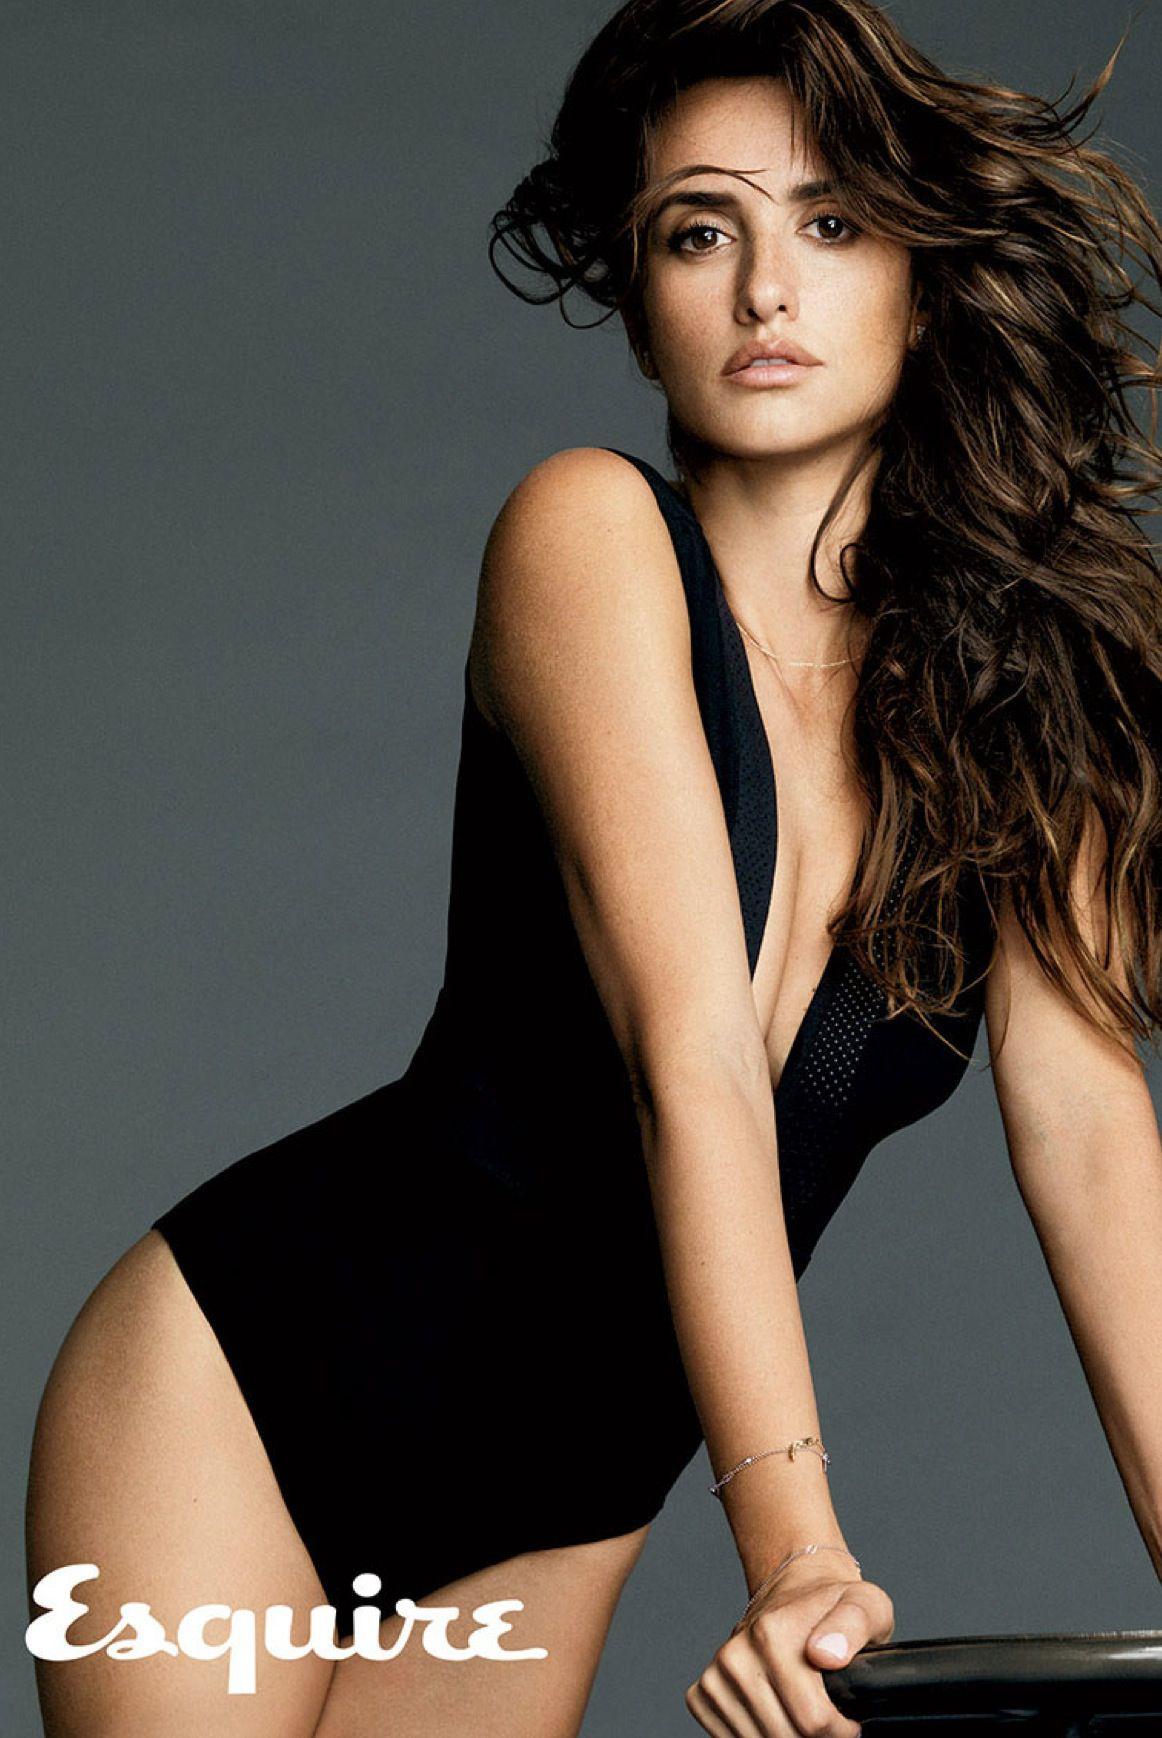 Esquire-Penelope-Cruz-mujer-sexy-mundo-2014 (5)